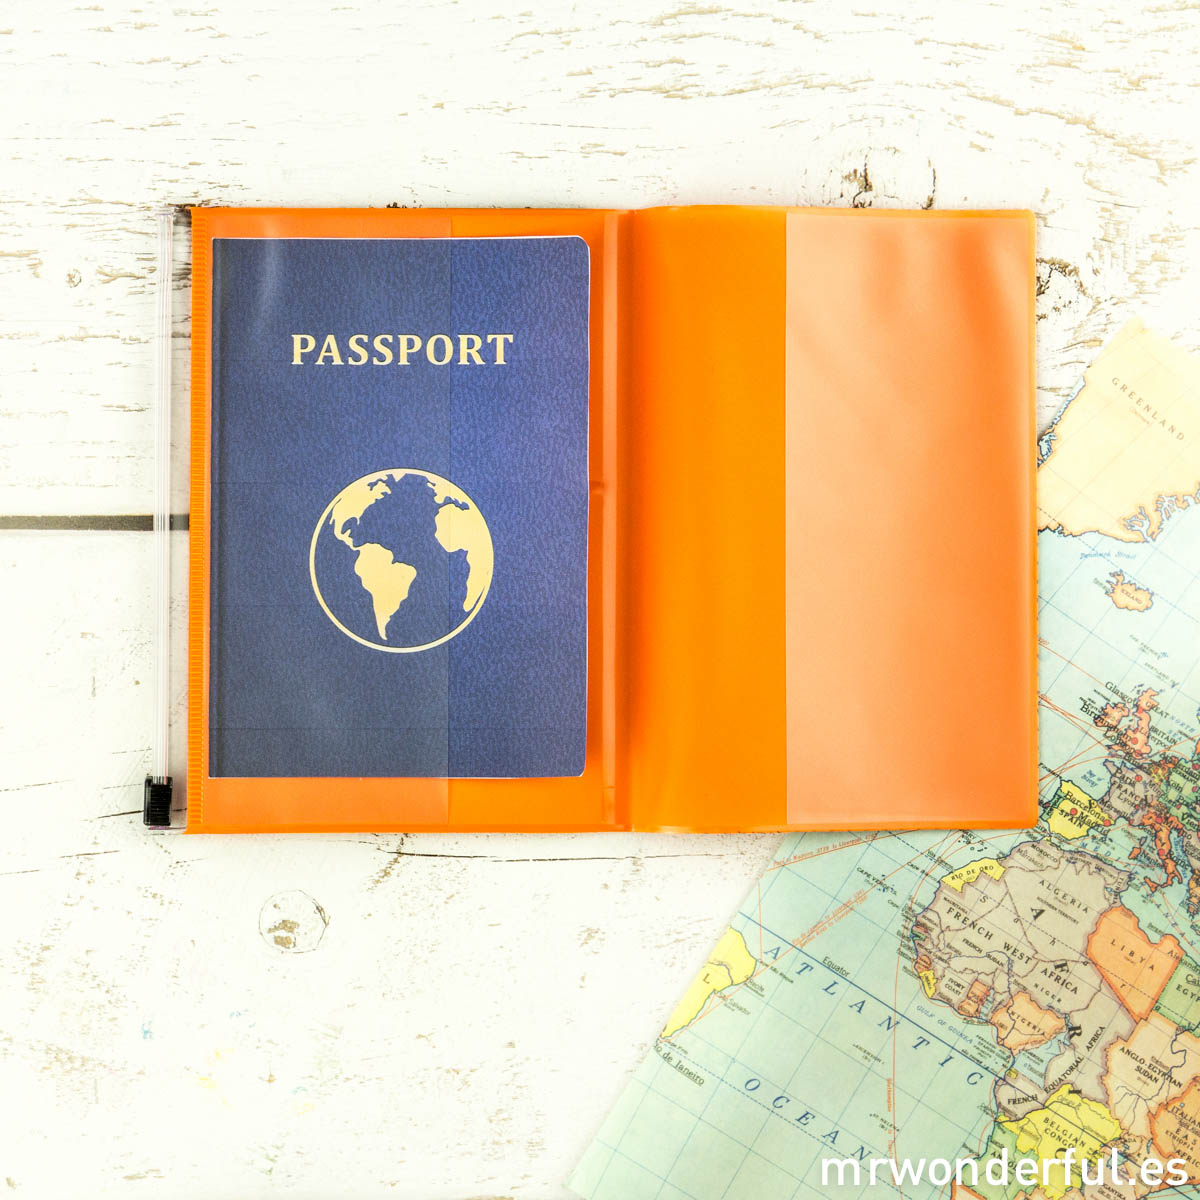 mrwonderful_TVK-PP1-ROR_funda-pasaporte-naranja-11